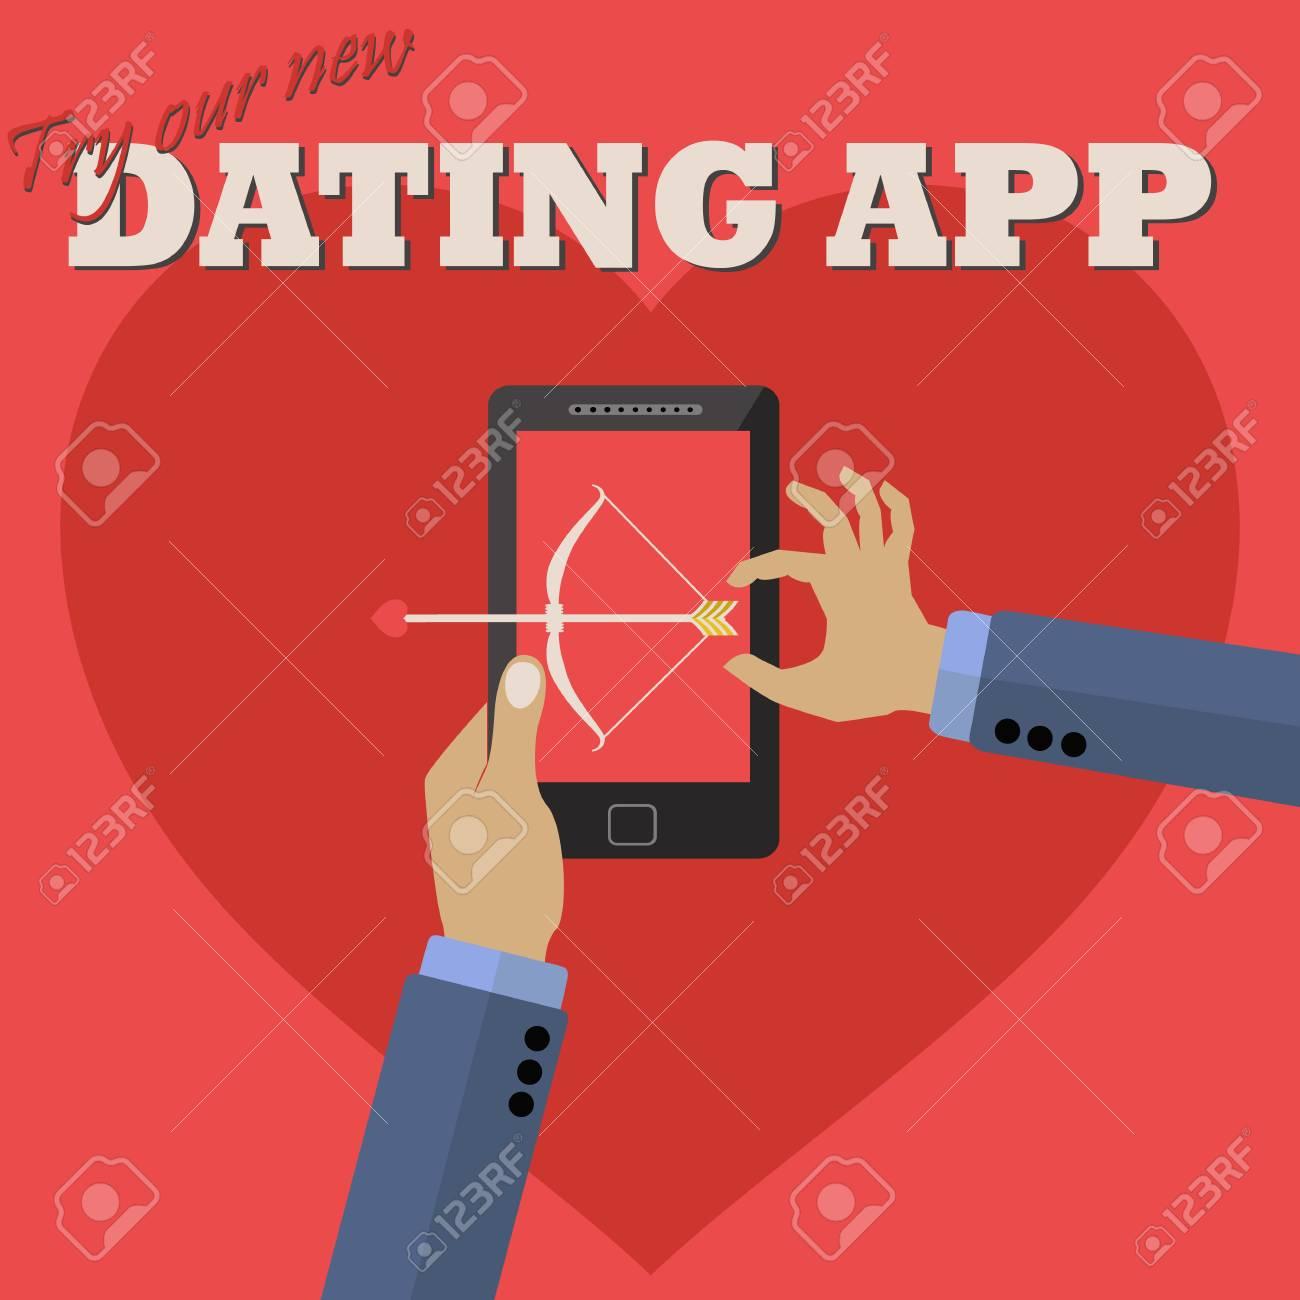 Duitse gay dating website